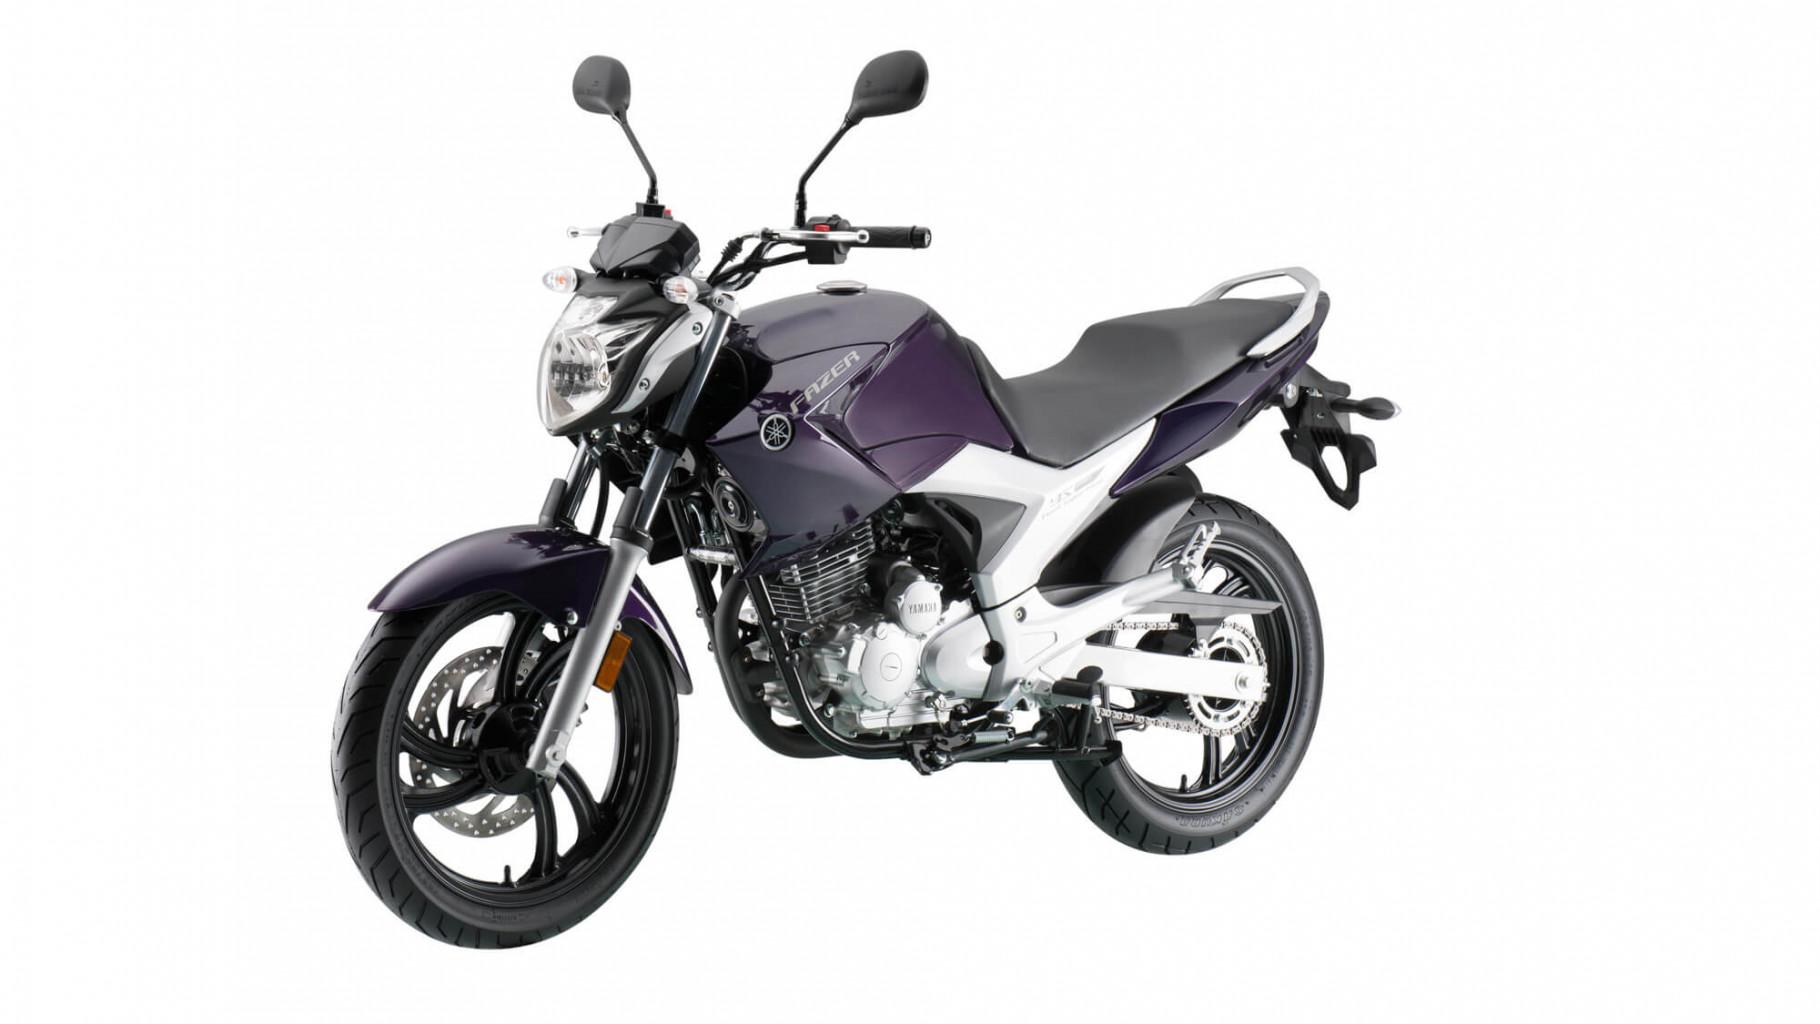 2016-Yamaha-Fazer-250-RU-Cosmic-Purple-Action-001.jpg